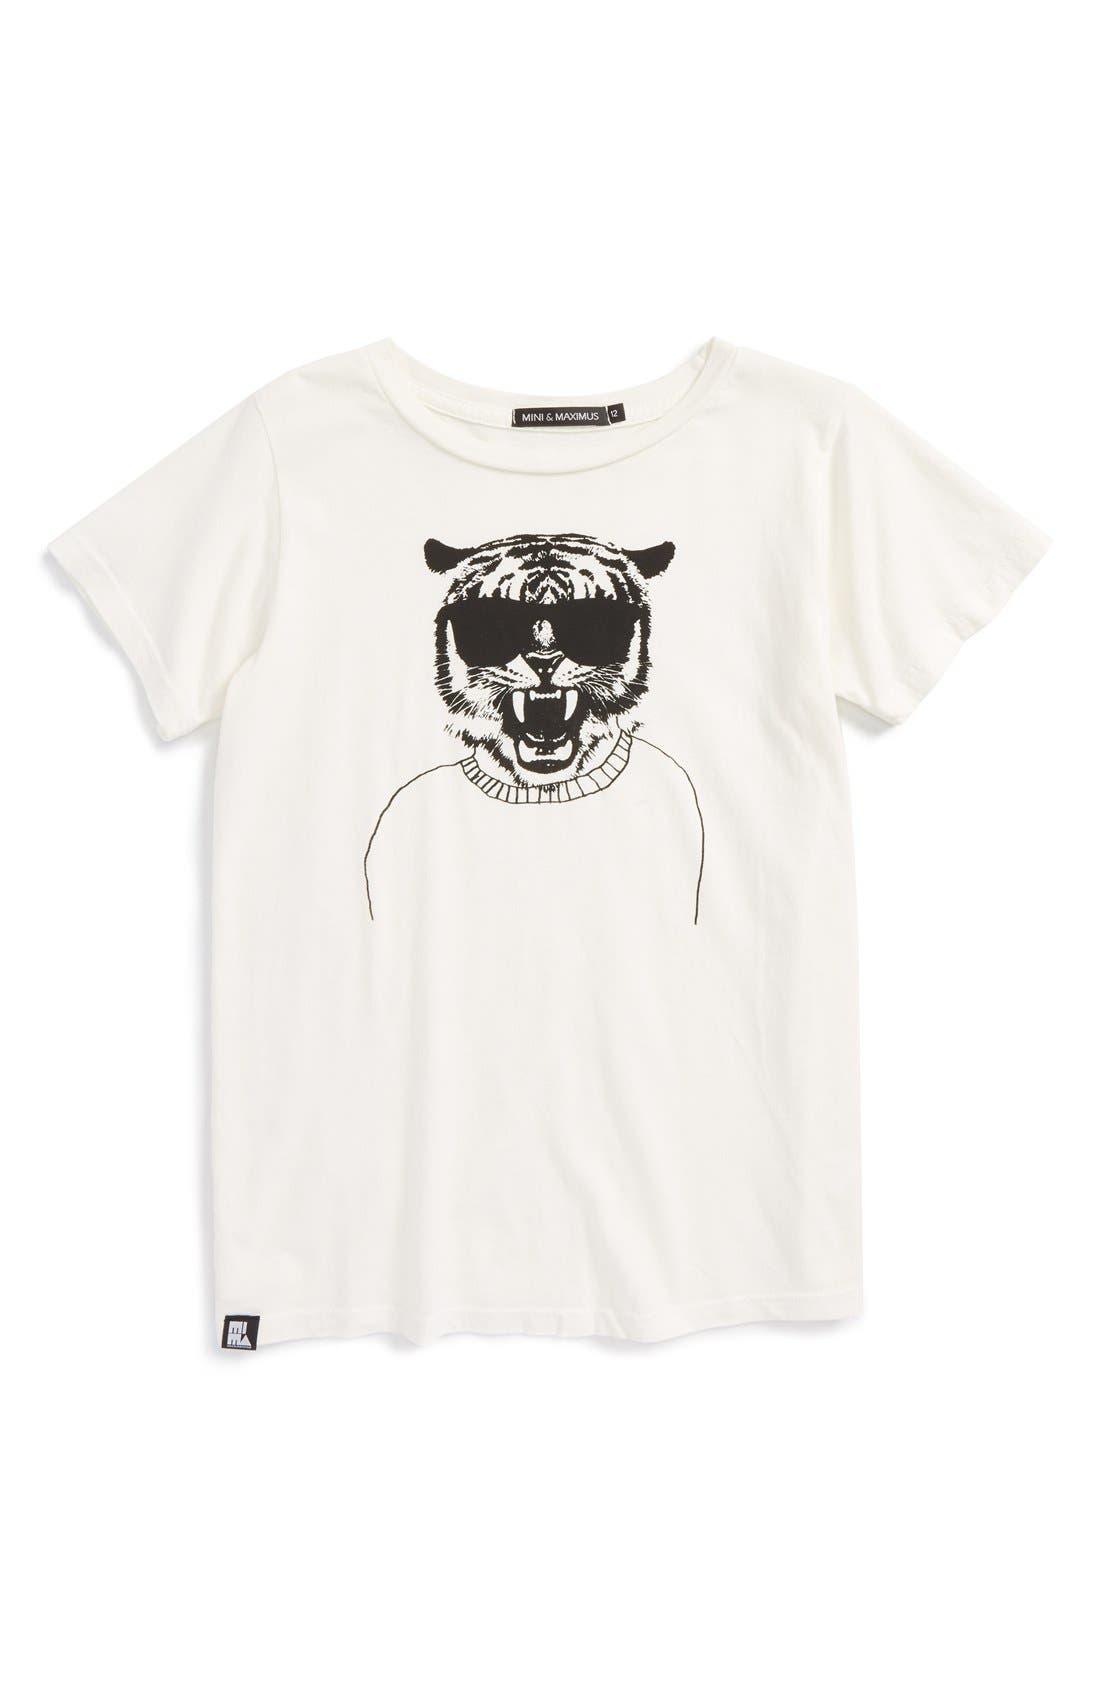 Main Image - Mini &Maximus'I Bite' Graphic T-Shirt(Toddler Boys, Little Boys & Big Boys)